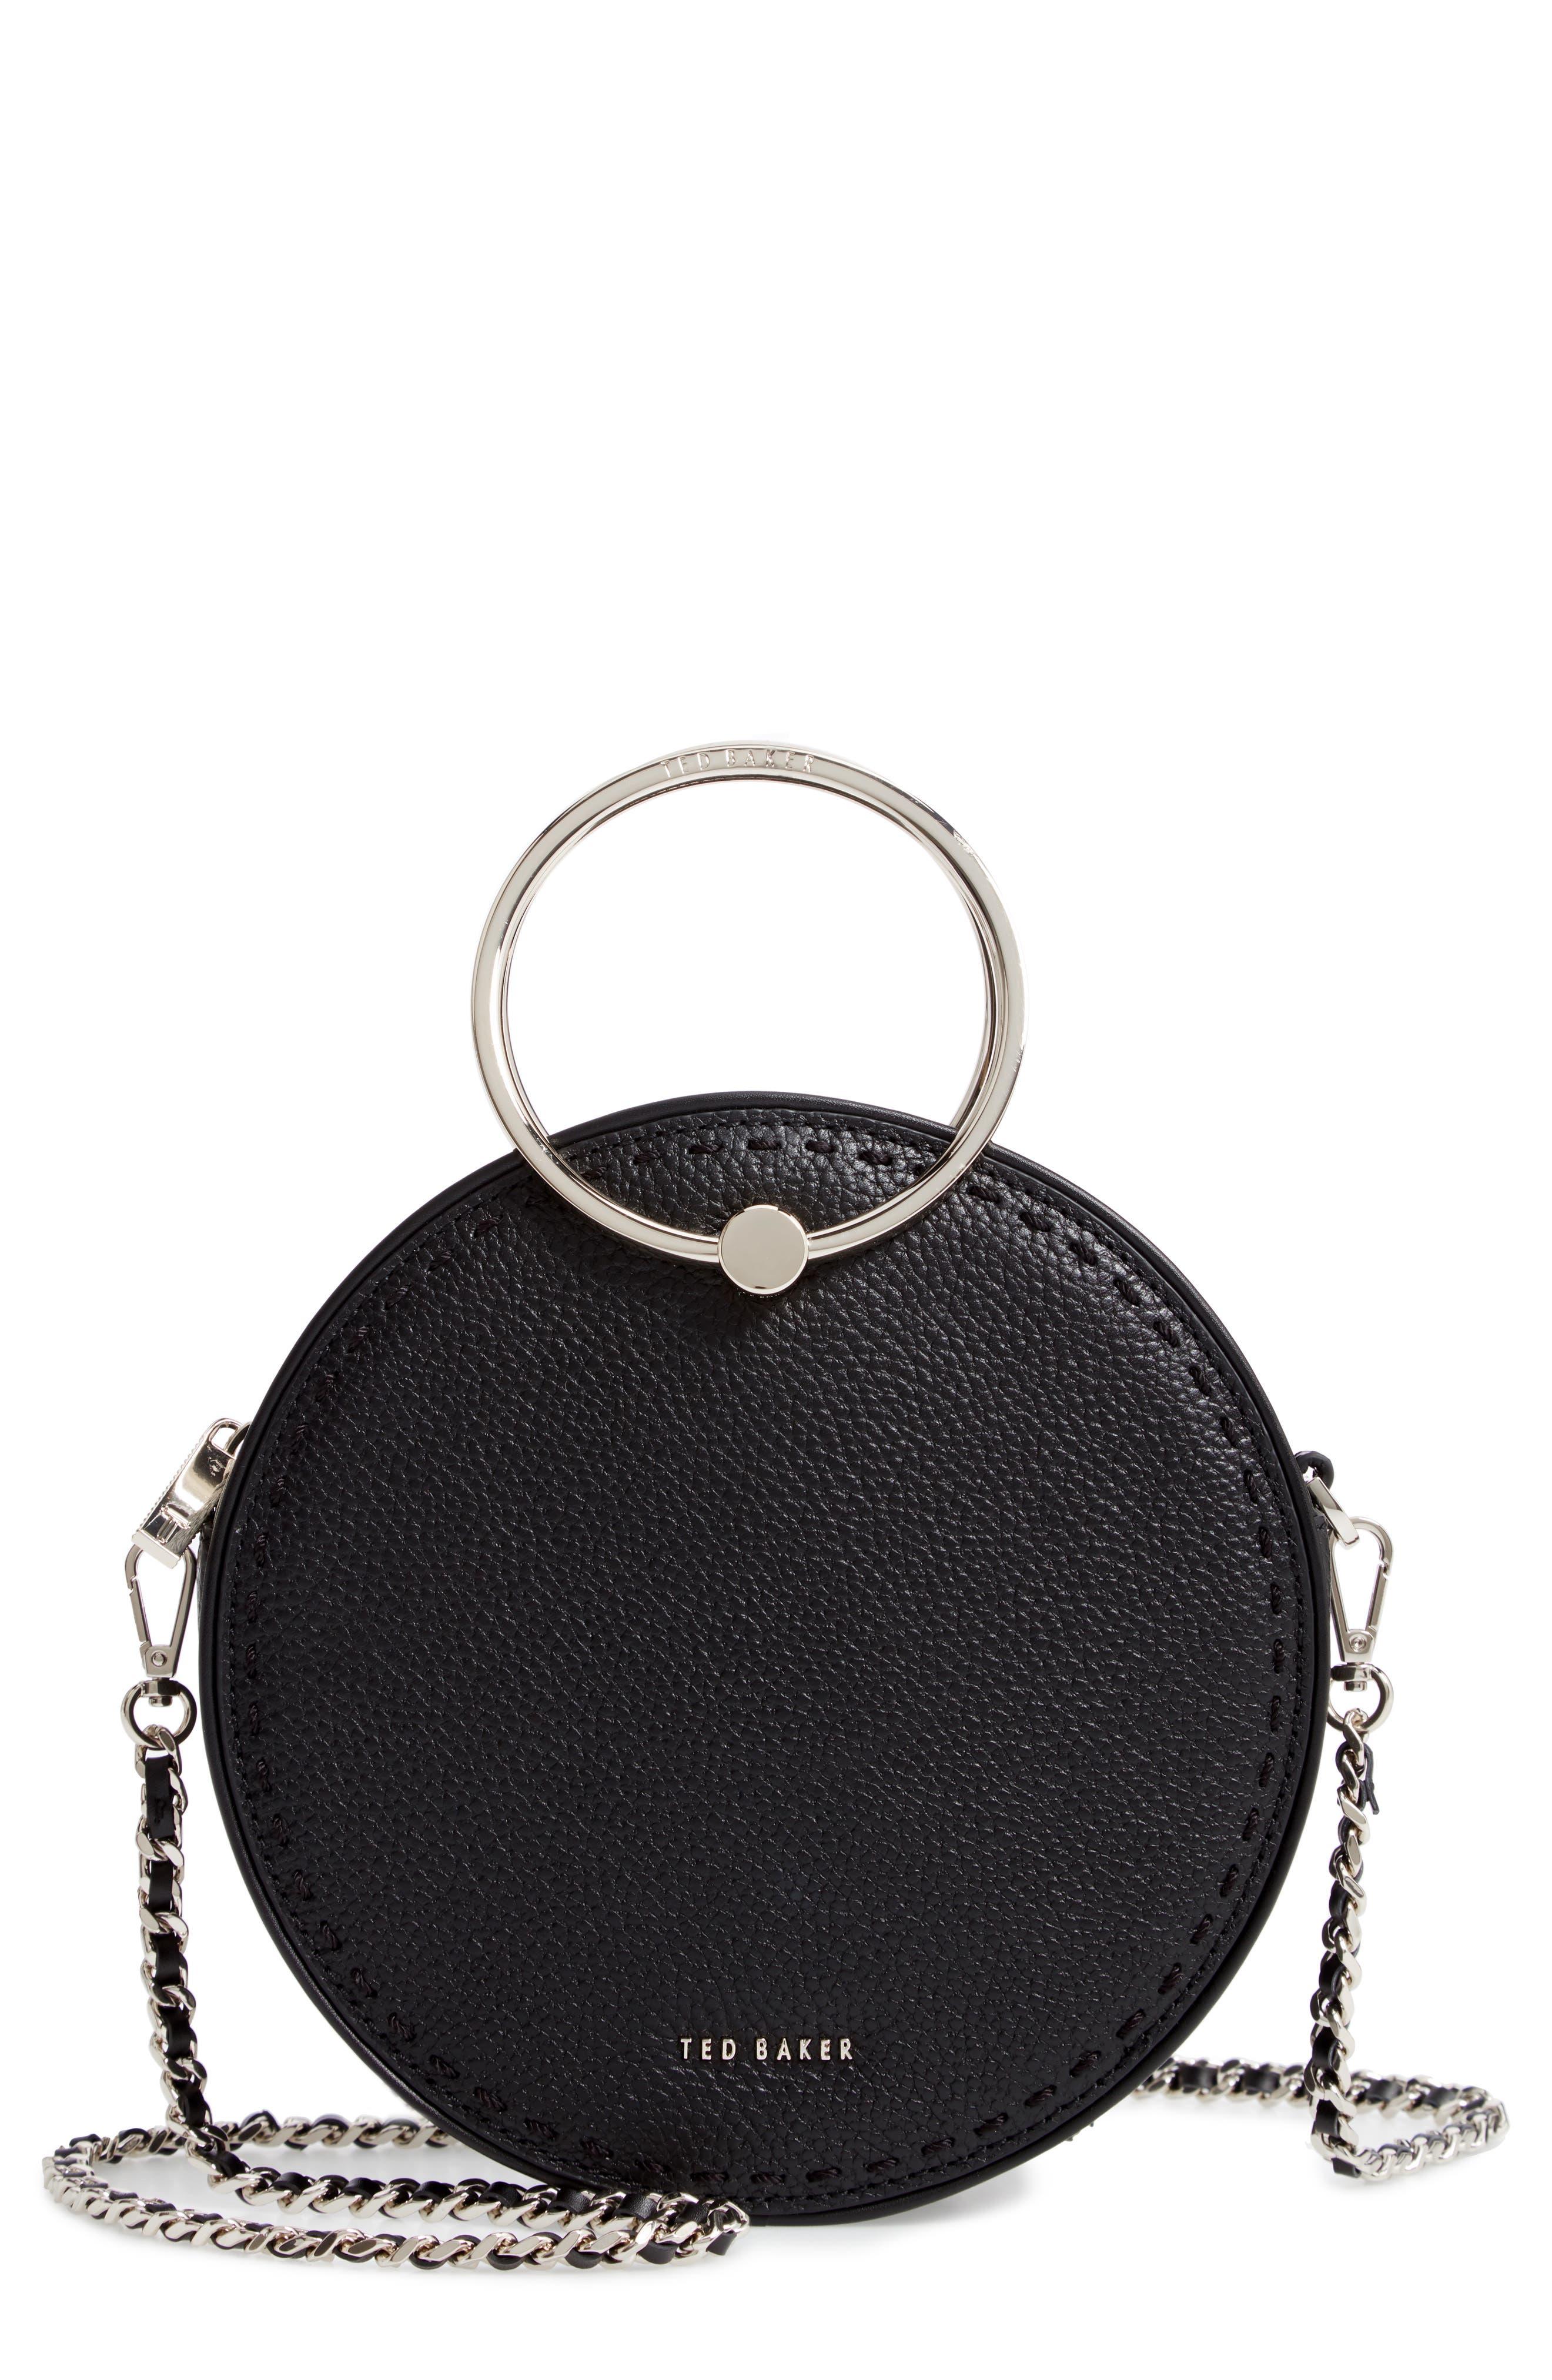 5cb59750d Ted Baker London Crossbody Bags